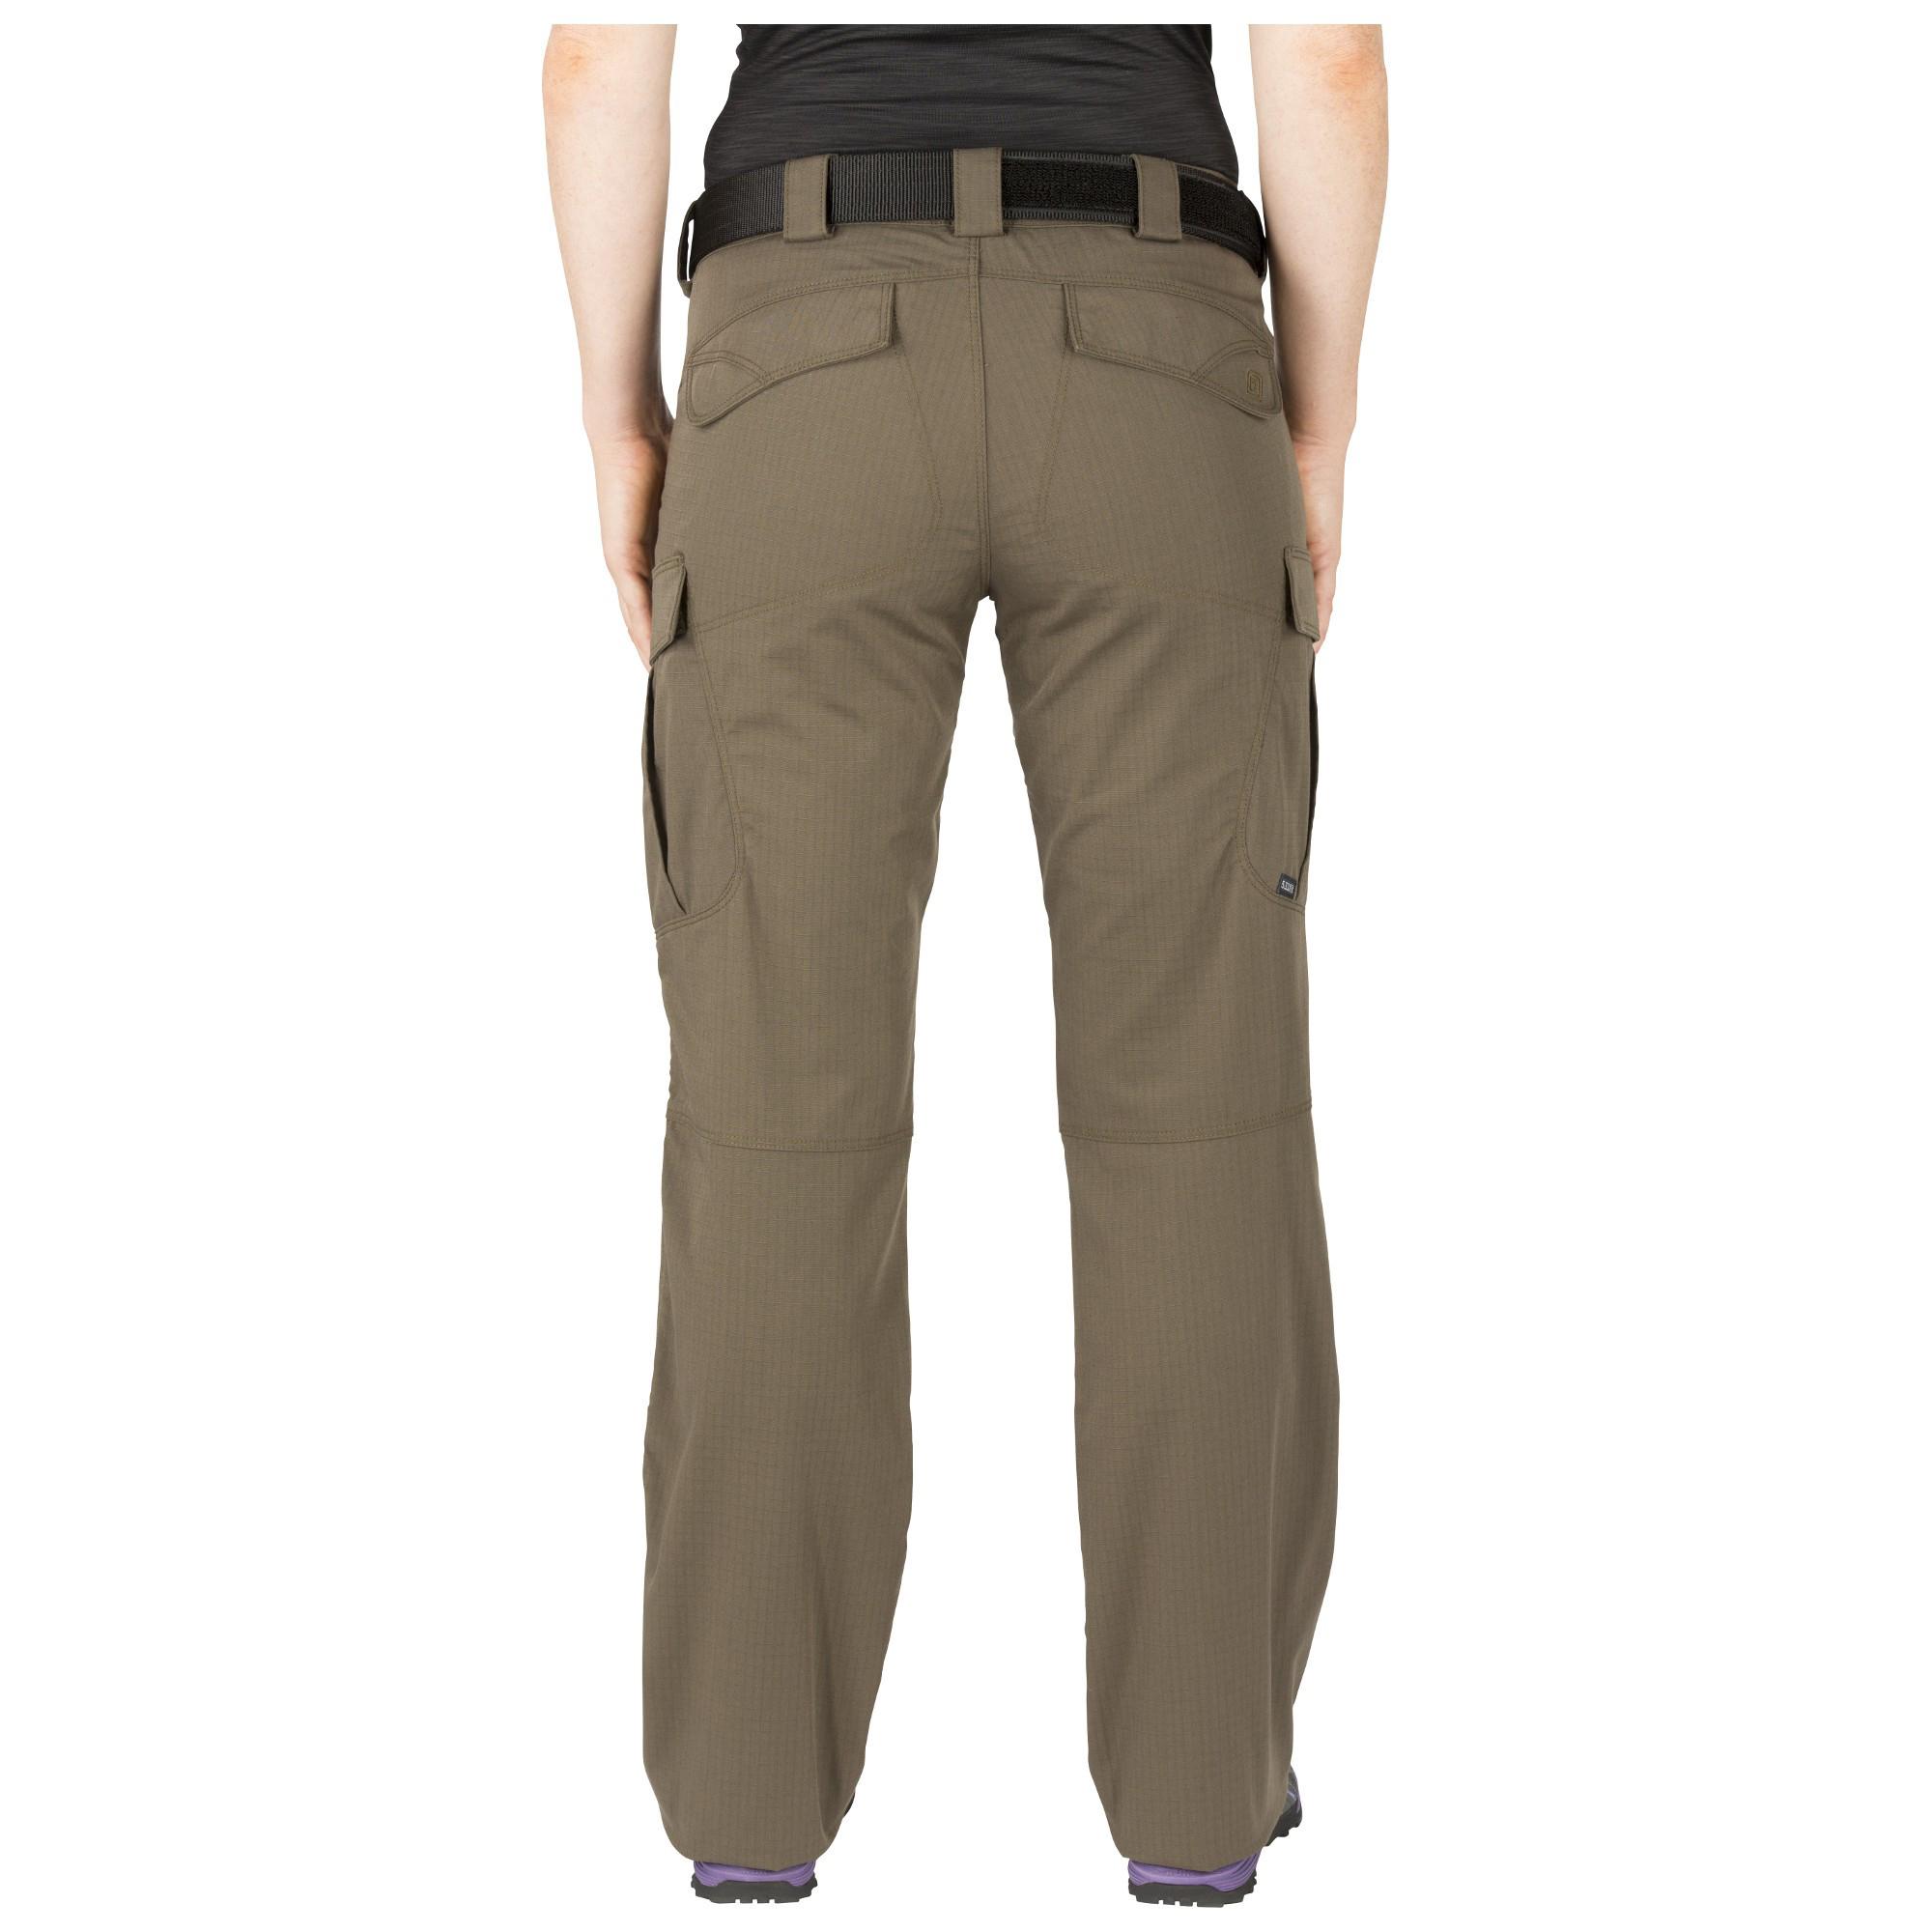 5.11 INC Women's Stryke Pant with Flex-Tac Rip Stop, Tundra